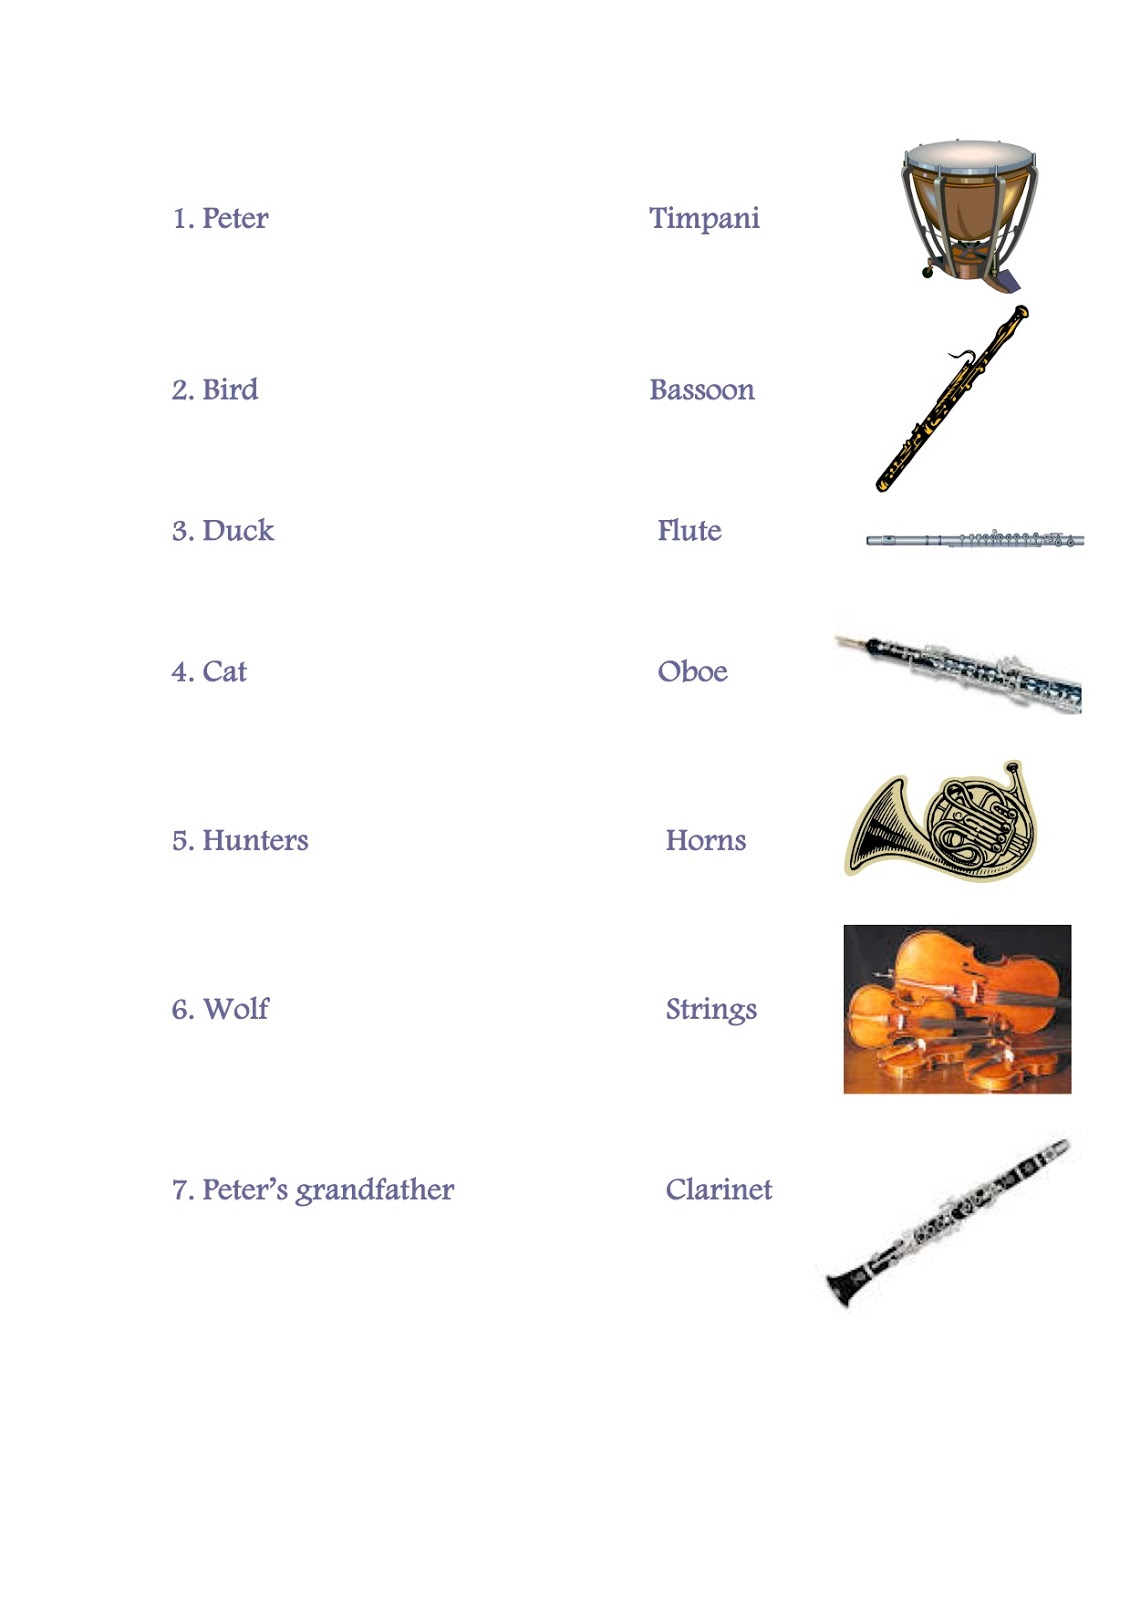 Harris Invictus Music Blog: Autumn 2: Instruments of the